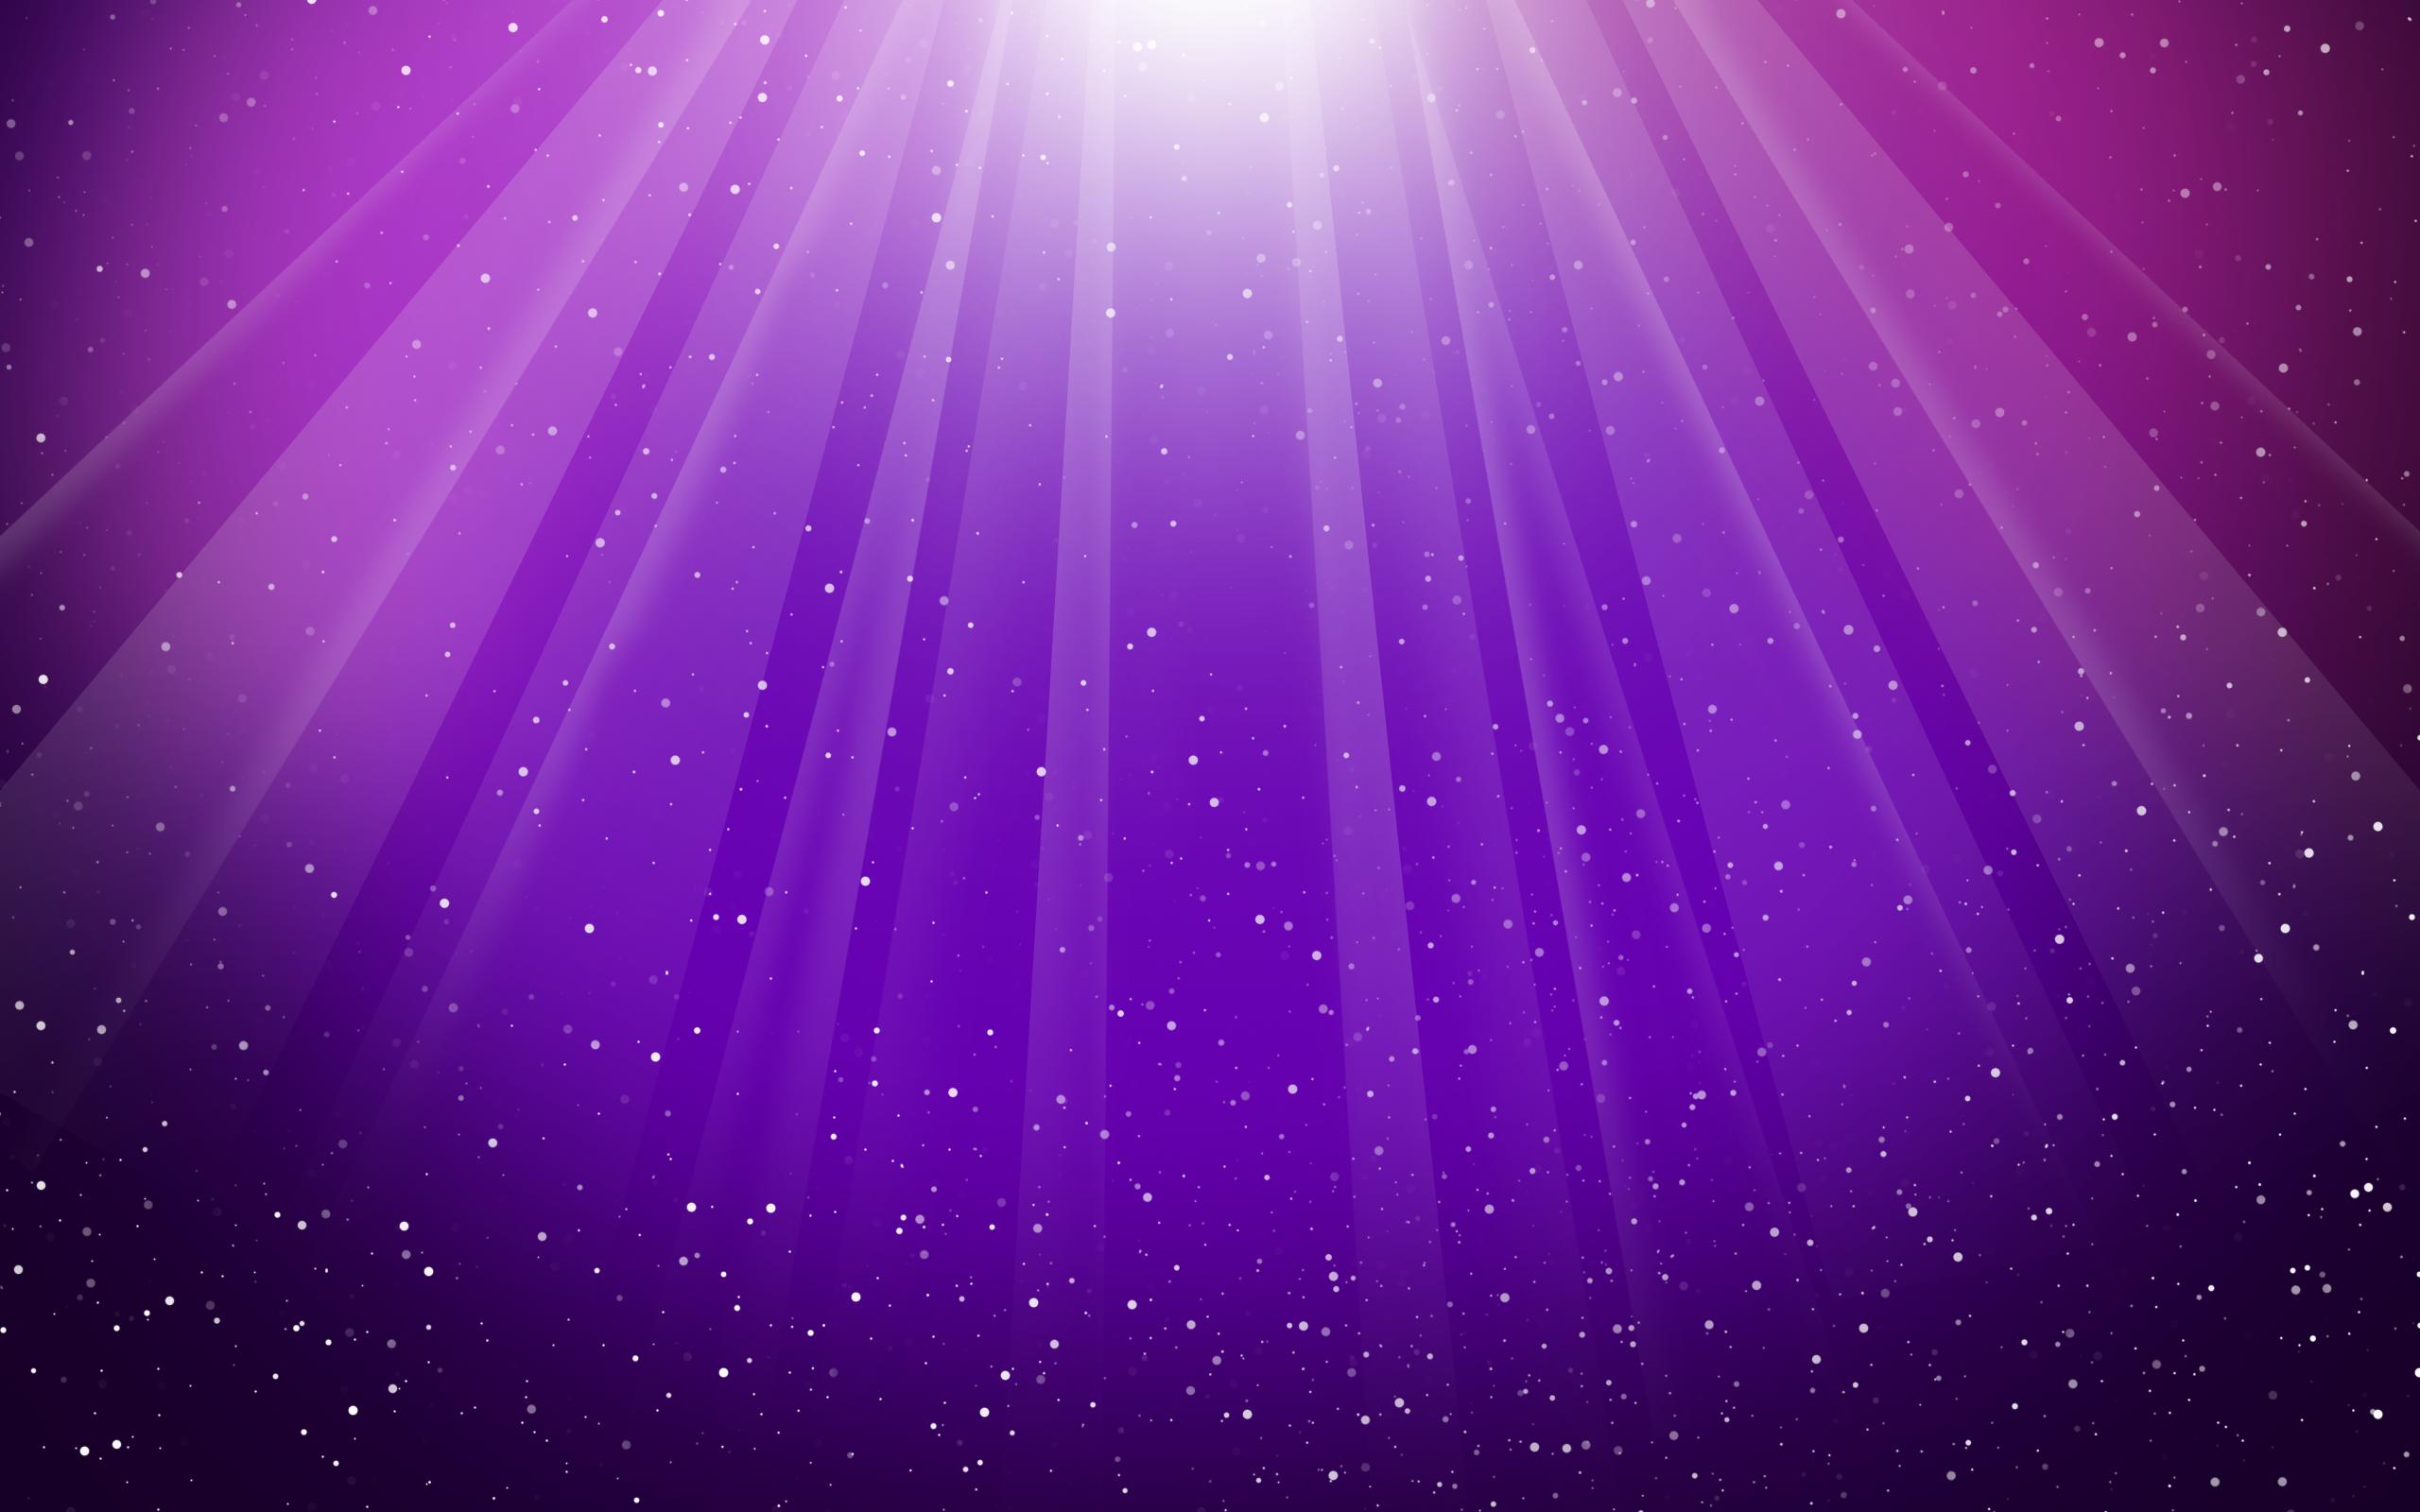 Cool Purple Wallpaper Backgrounds